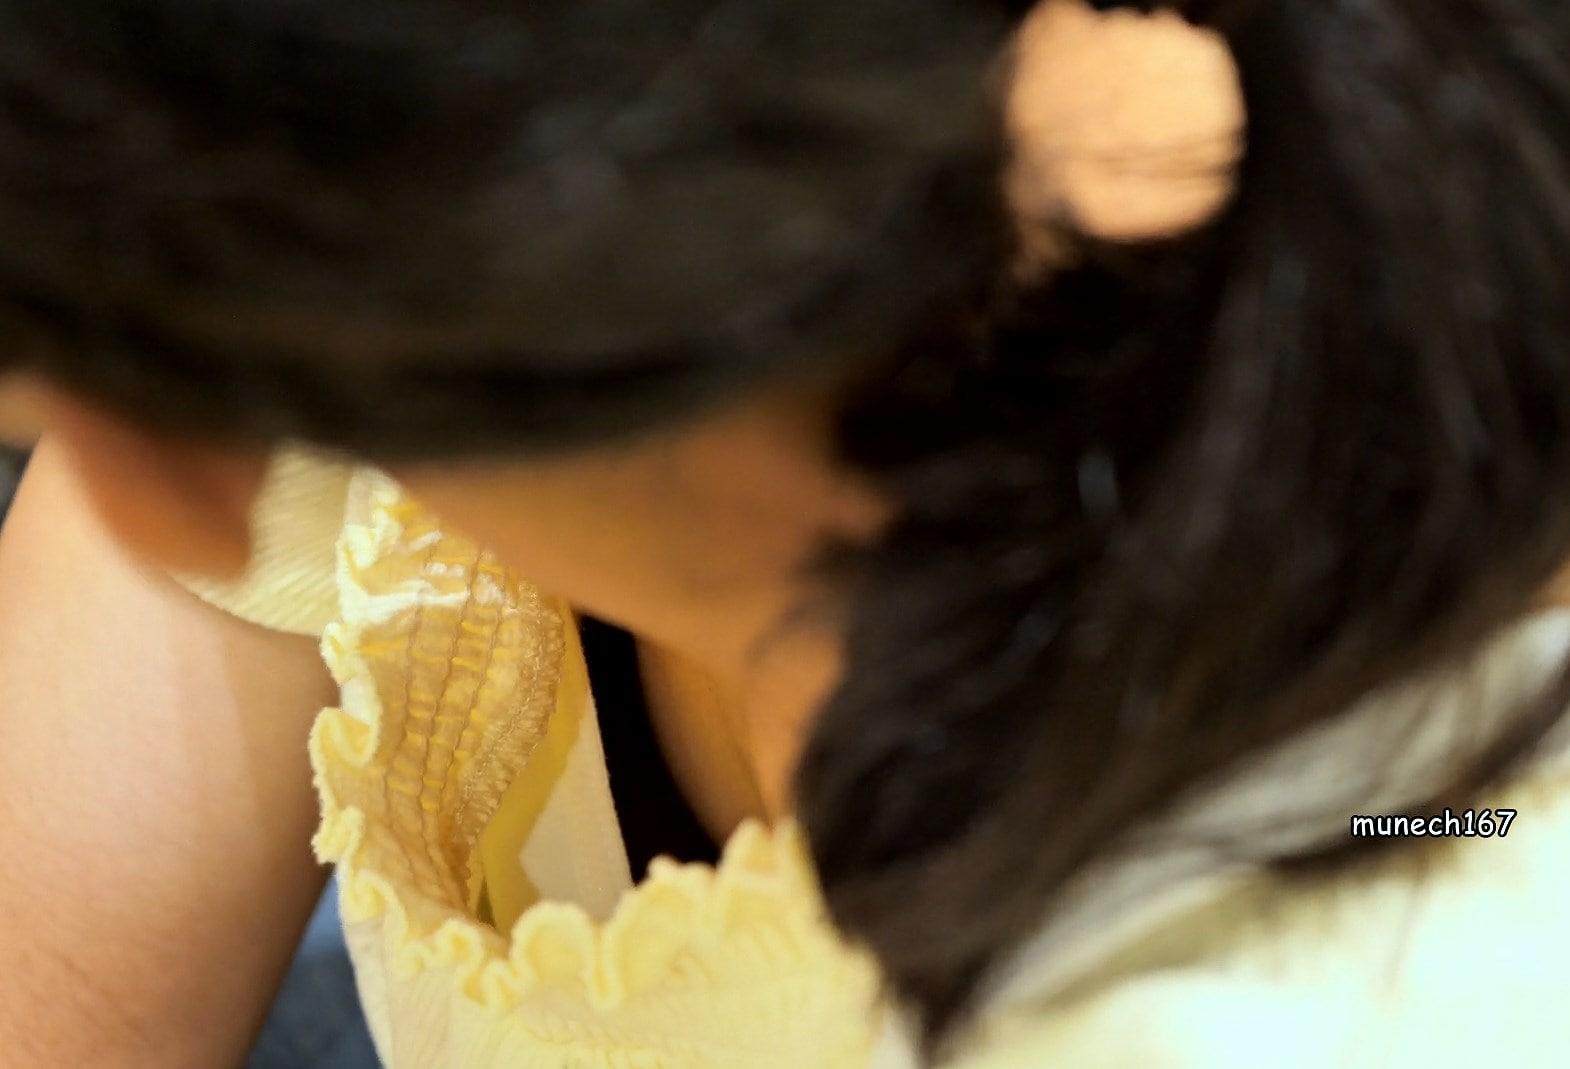 munech167 小ぶりなオッパイから見える卑猥な乳首画像つき詳細レビュー